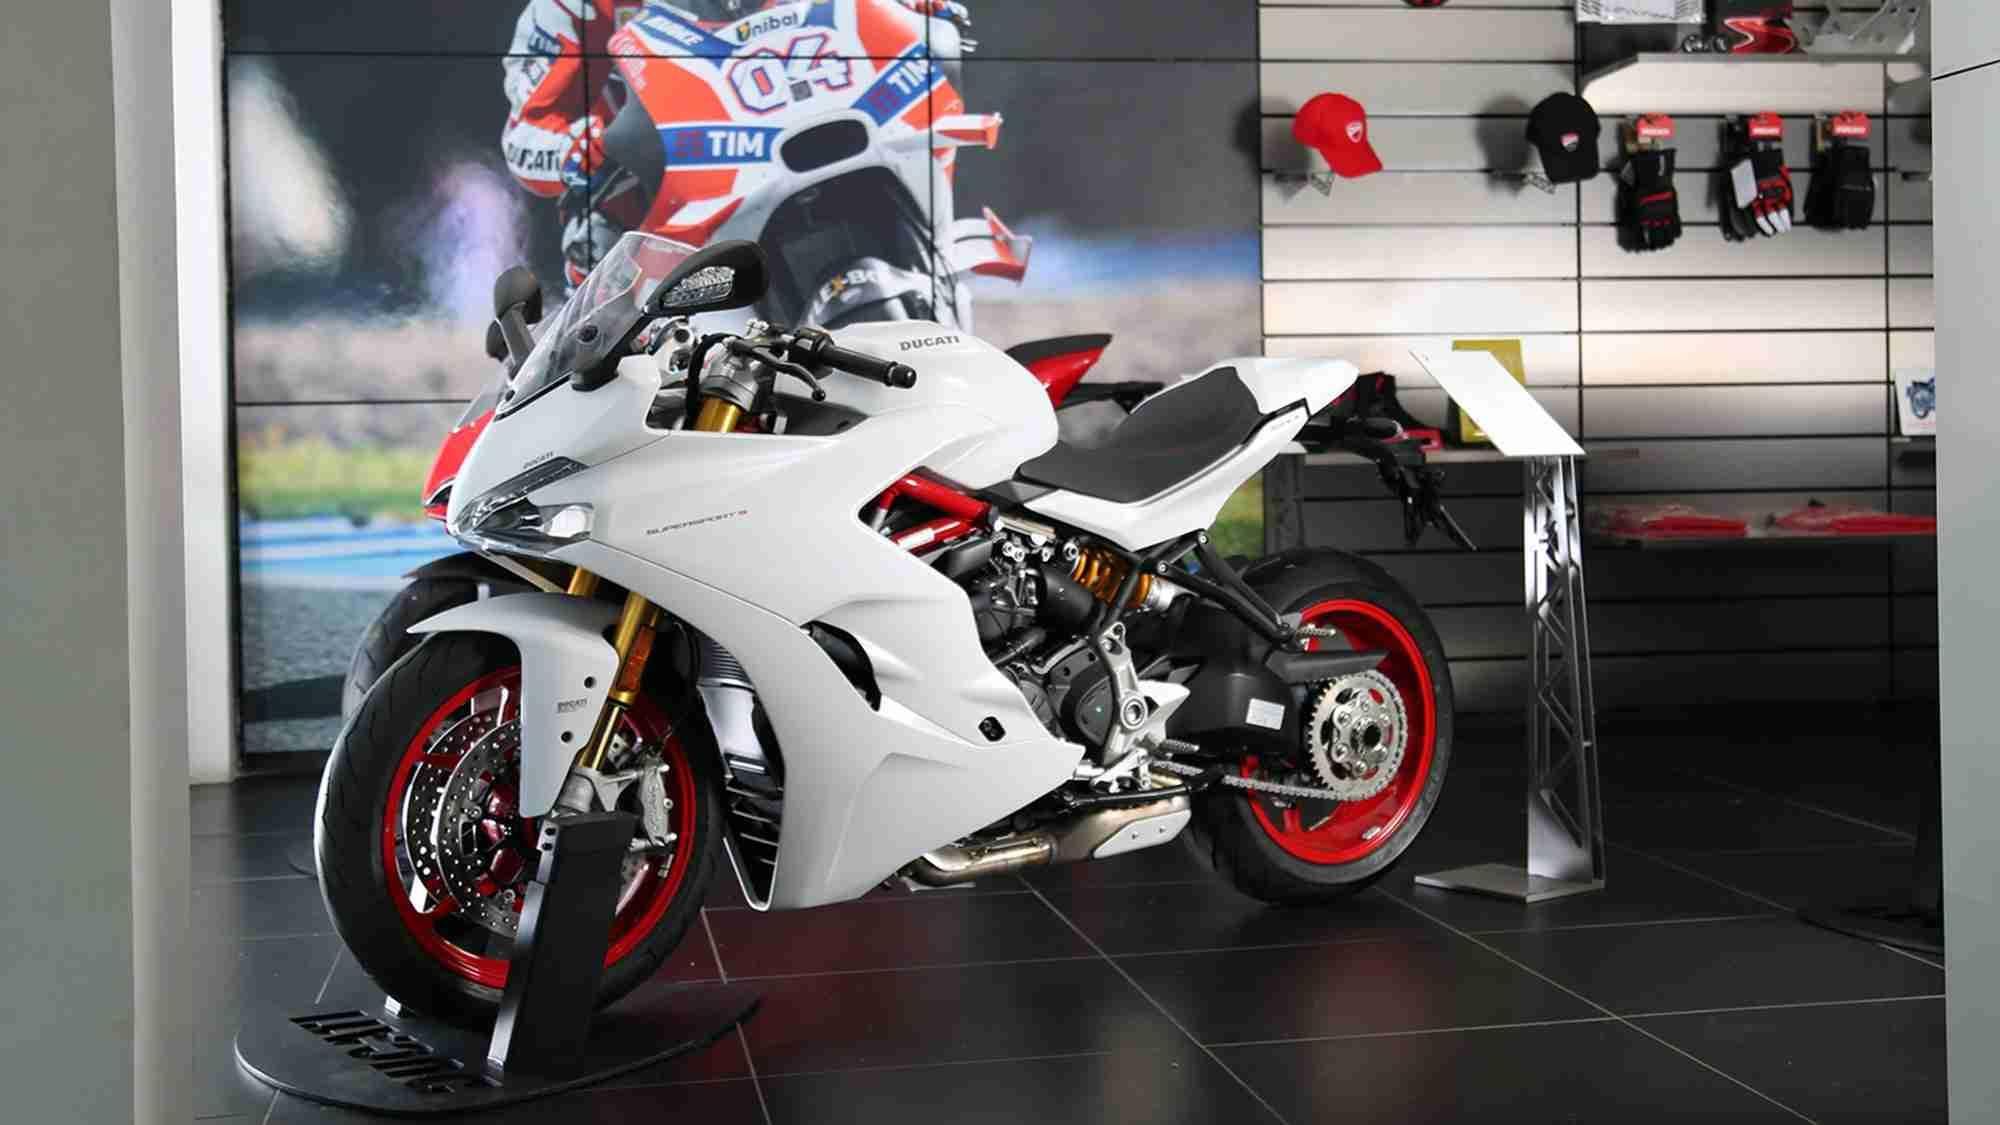 Ducati Chennai dealership now open